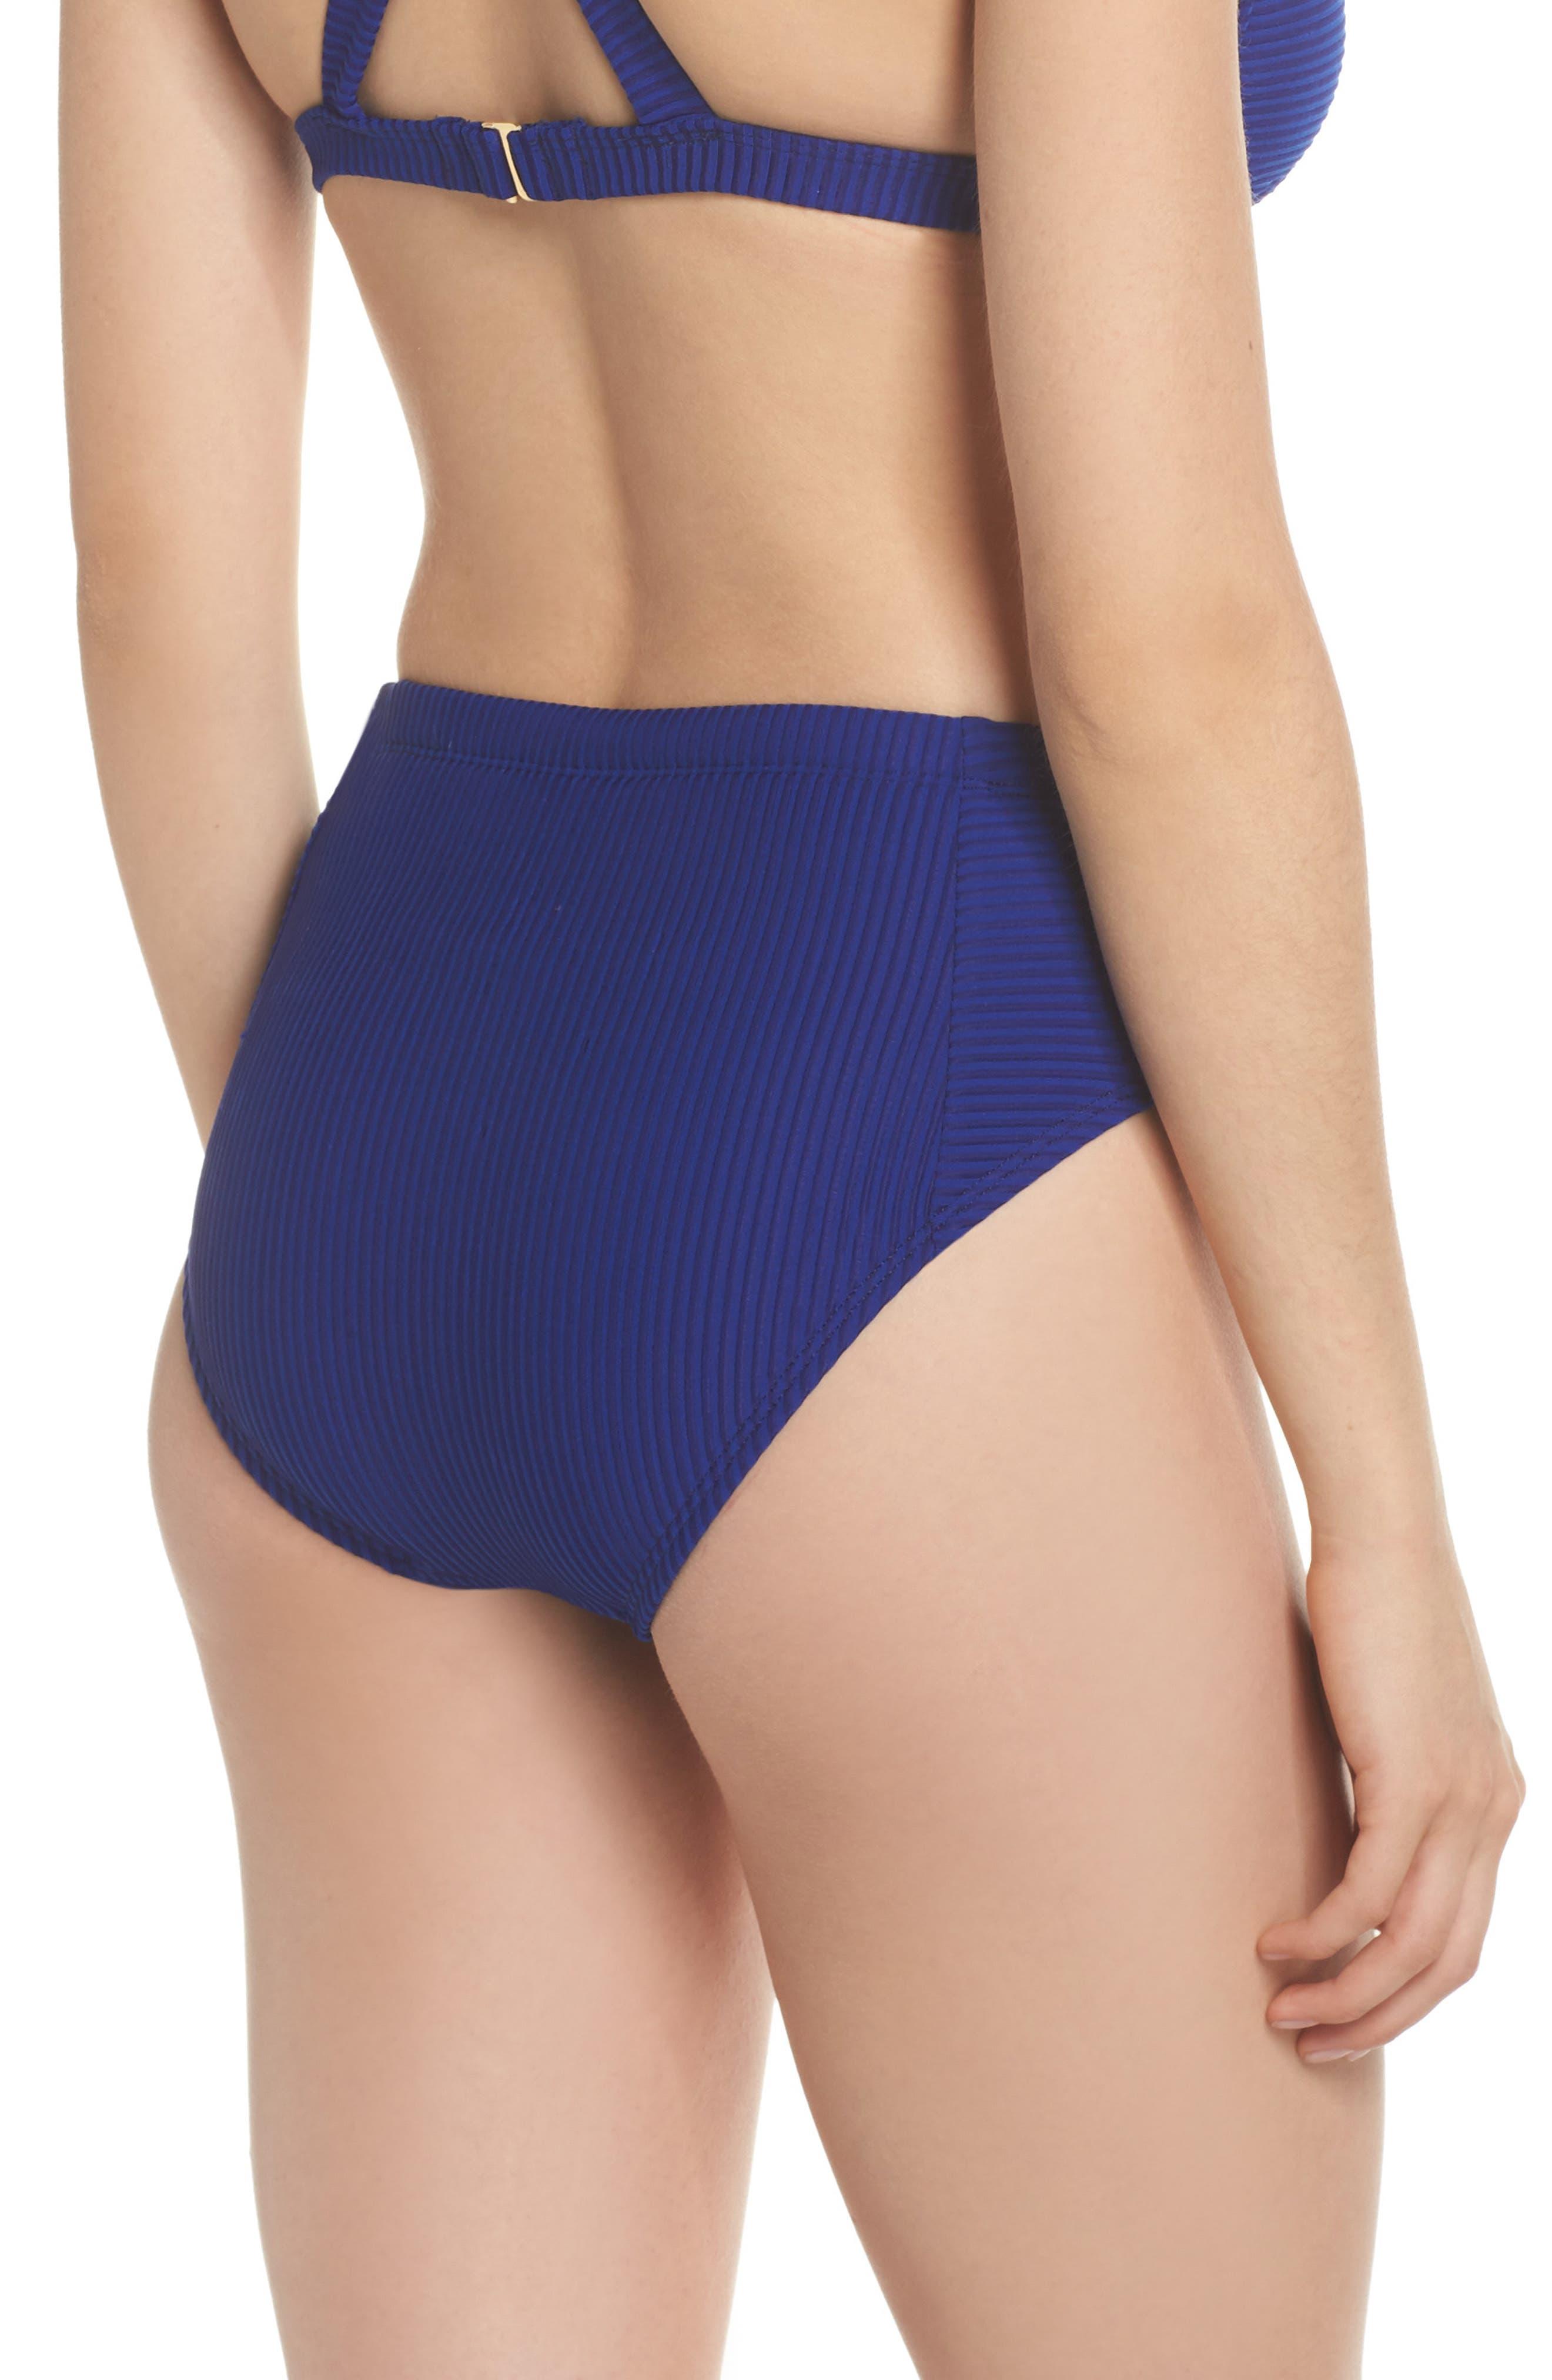 Becca High Waist Bikini Bottoms,                             Alternate thumbnail 2, color,                             Apollo Blue